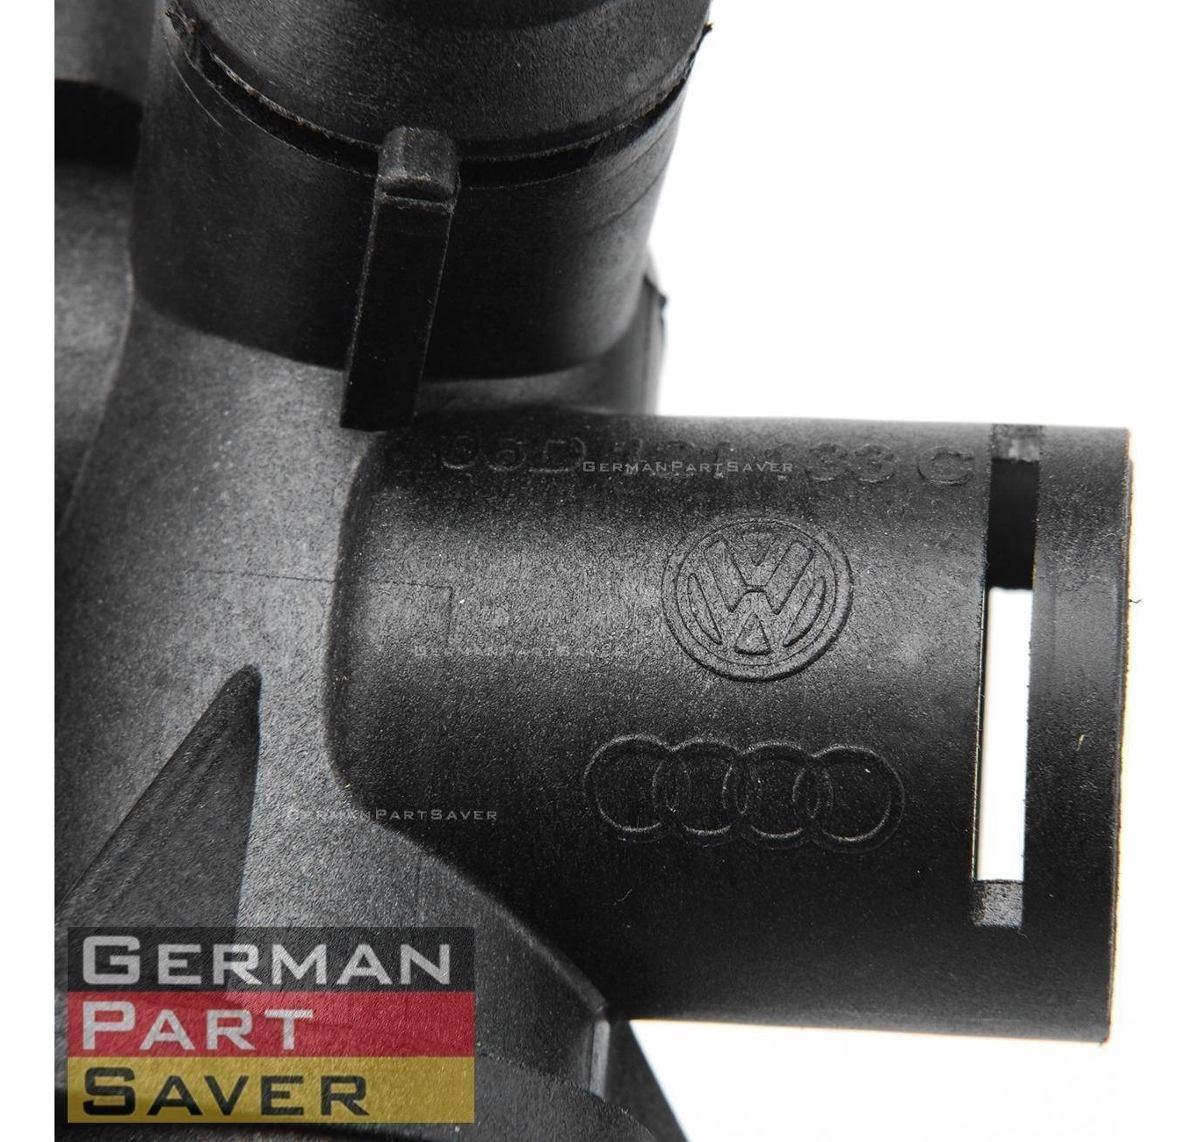 Genuine For Audi A4 A6 Quattro 2.0L Turbo Engine Coolant Flange Water 06D121132C